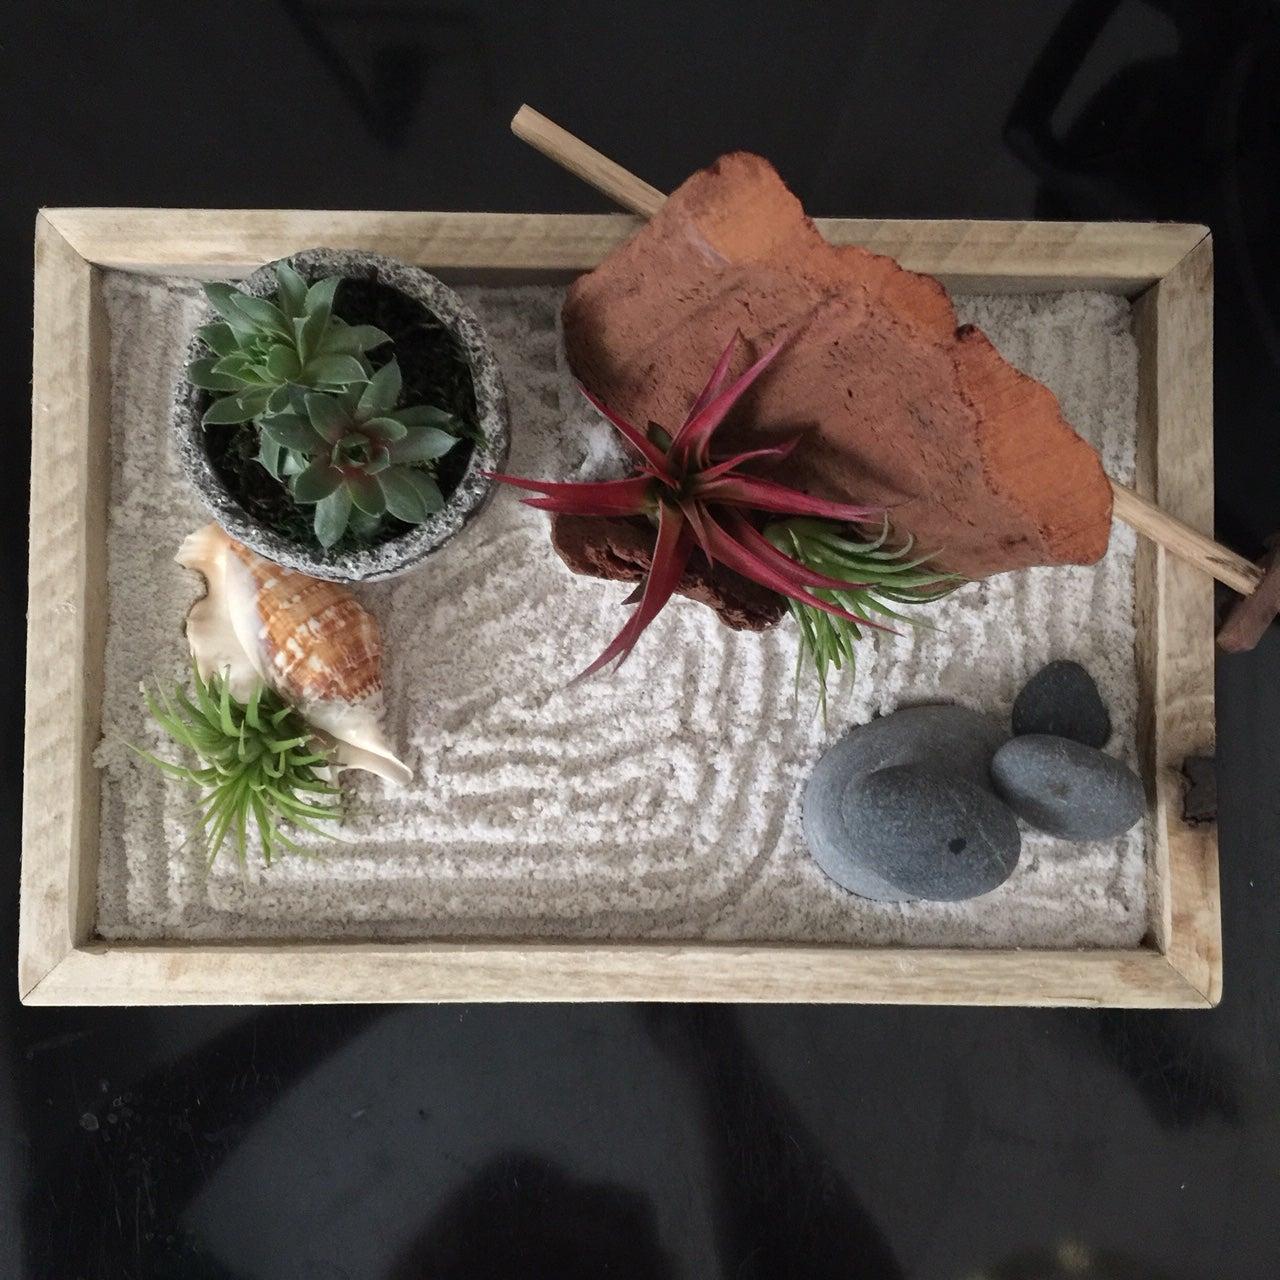 Mini Zen Garden Designing A Peaceful Zen Garden With Succulents